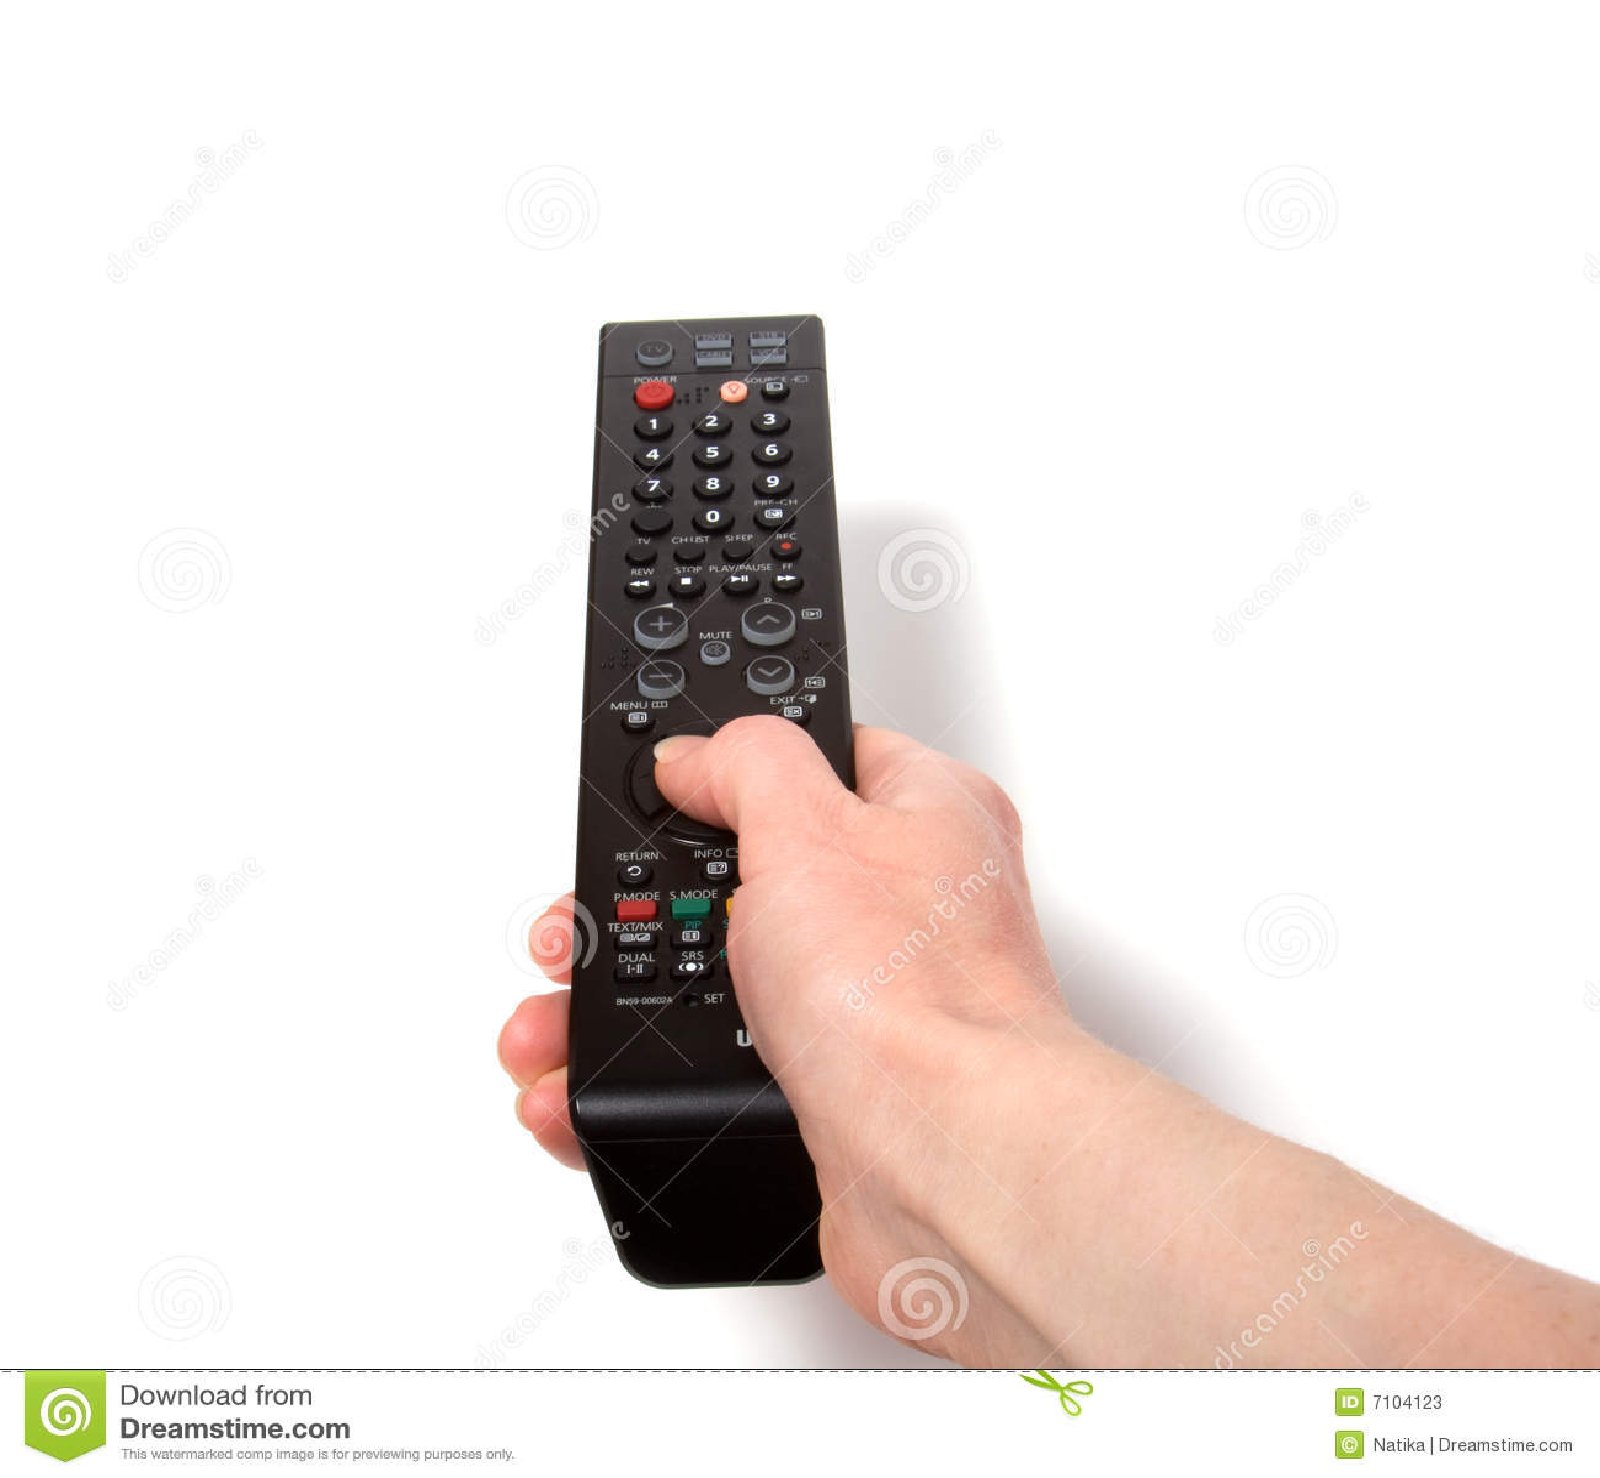 Scientists develop TV gesture control system